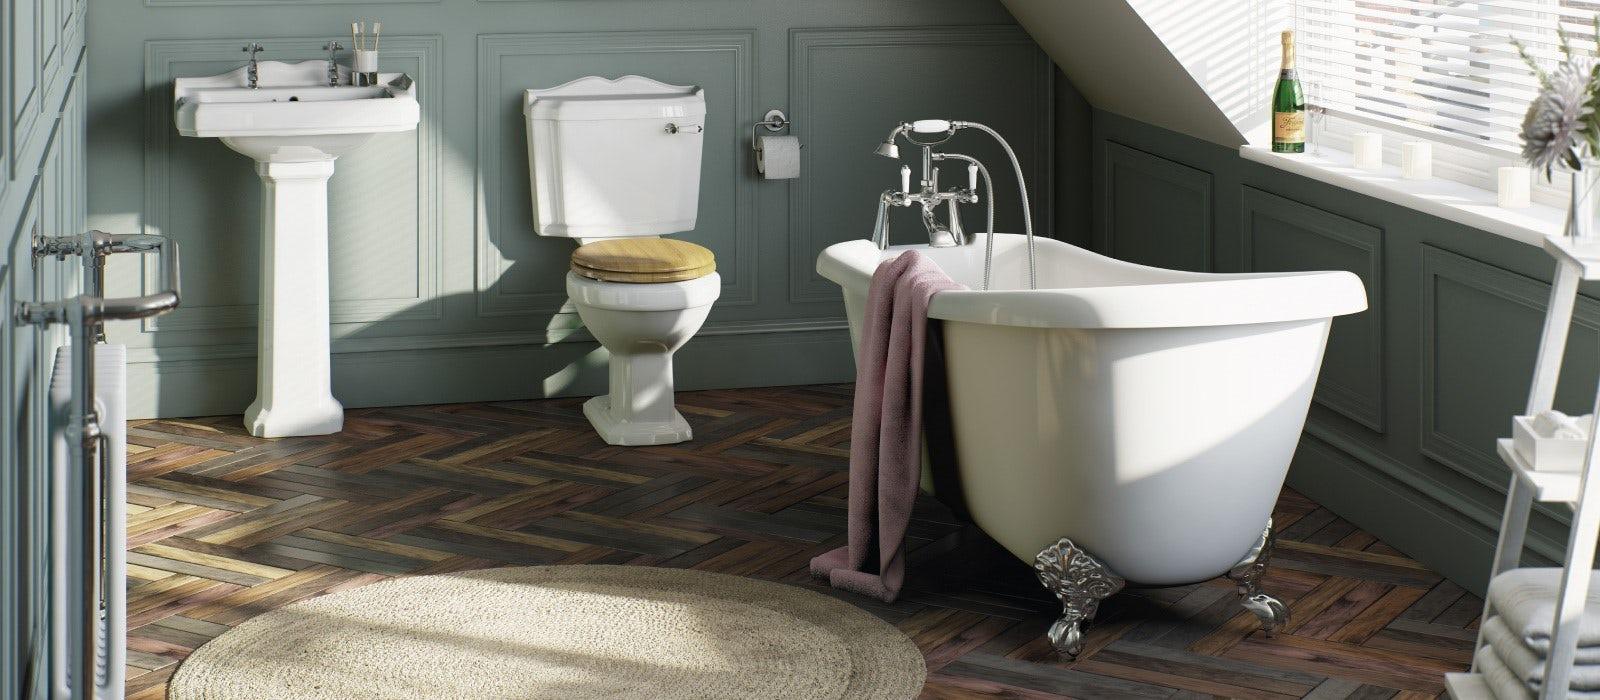 Traditional bathroom inspiration gallery